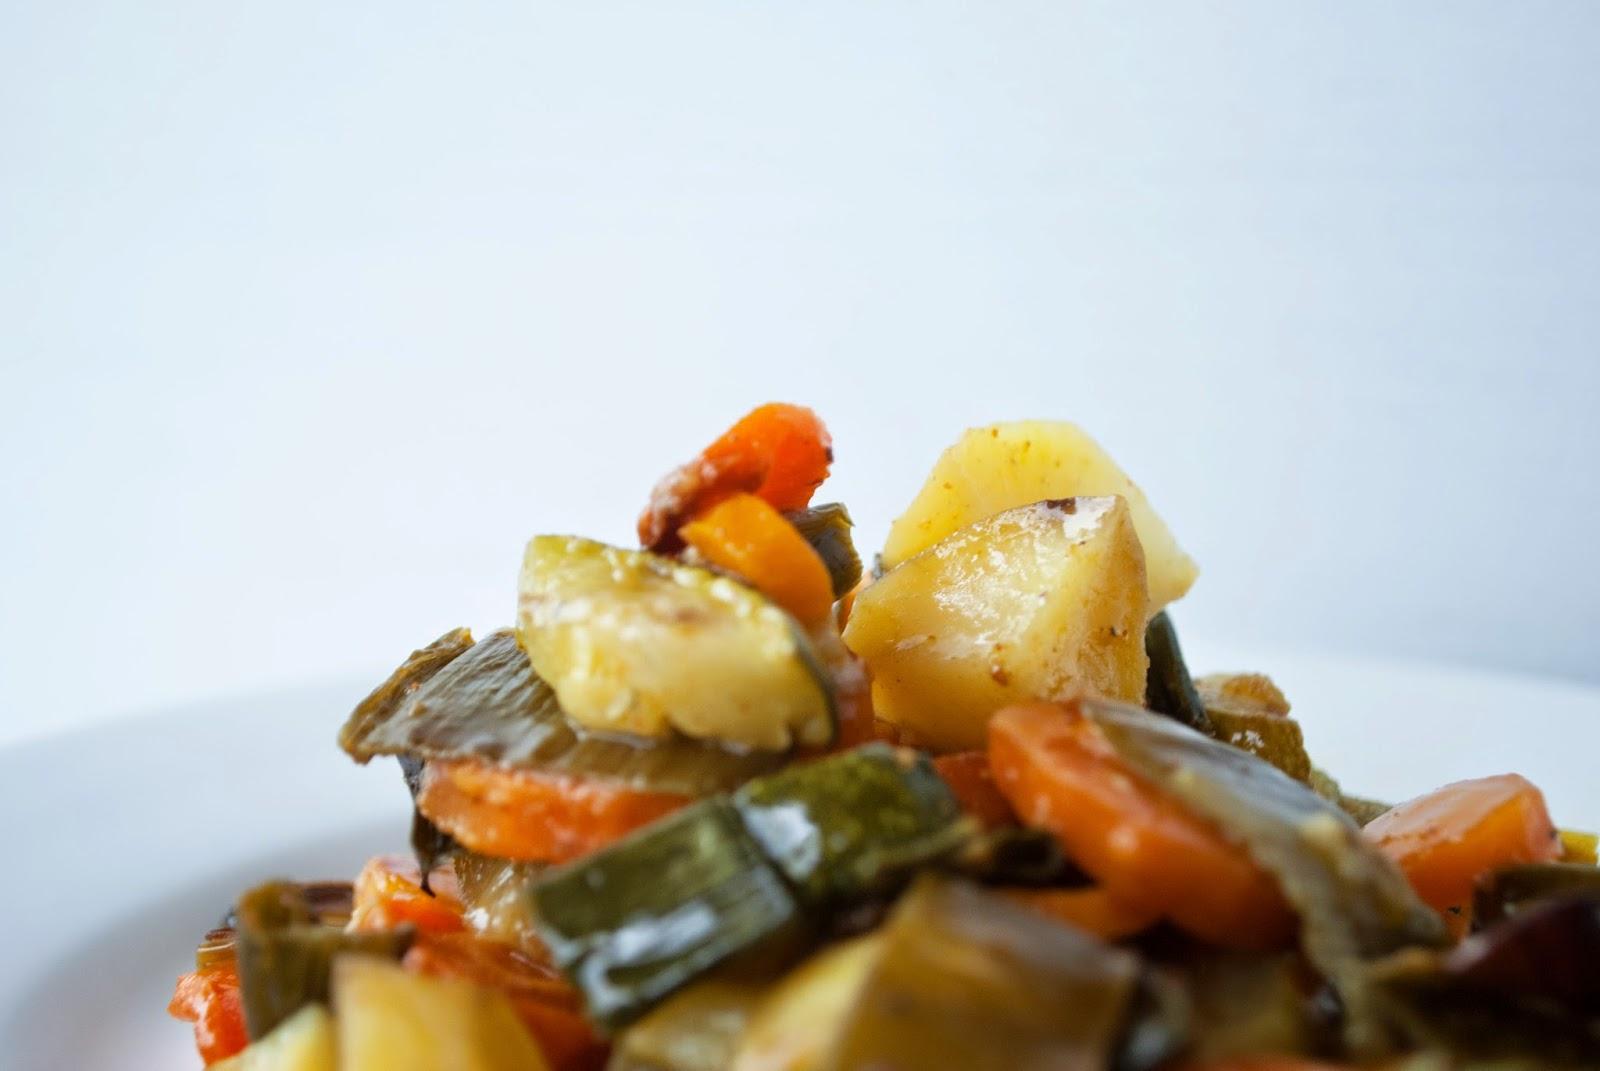 Dinner: Ofengemüse Abendessen Vegan Vegetarisch Gemüse lecker Sommer Rezept Dinner is Served Zucchini Karotten Lauch Kartoffeln Hupsis Serendipity